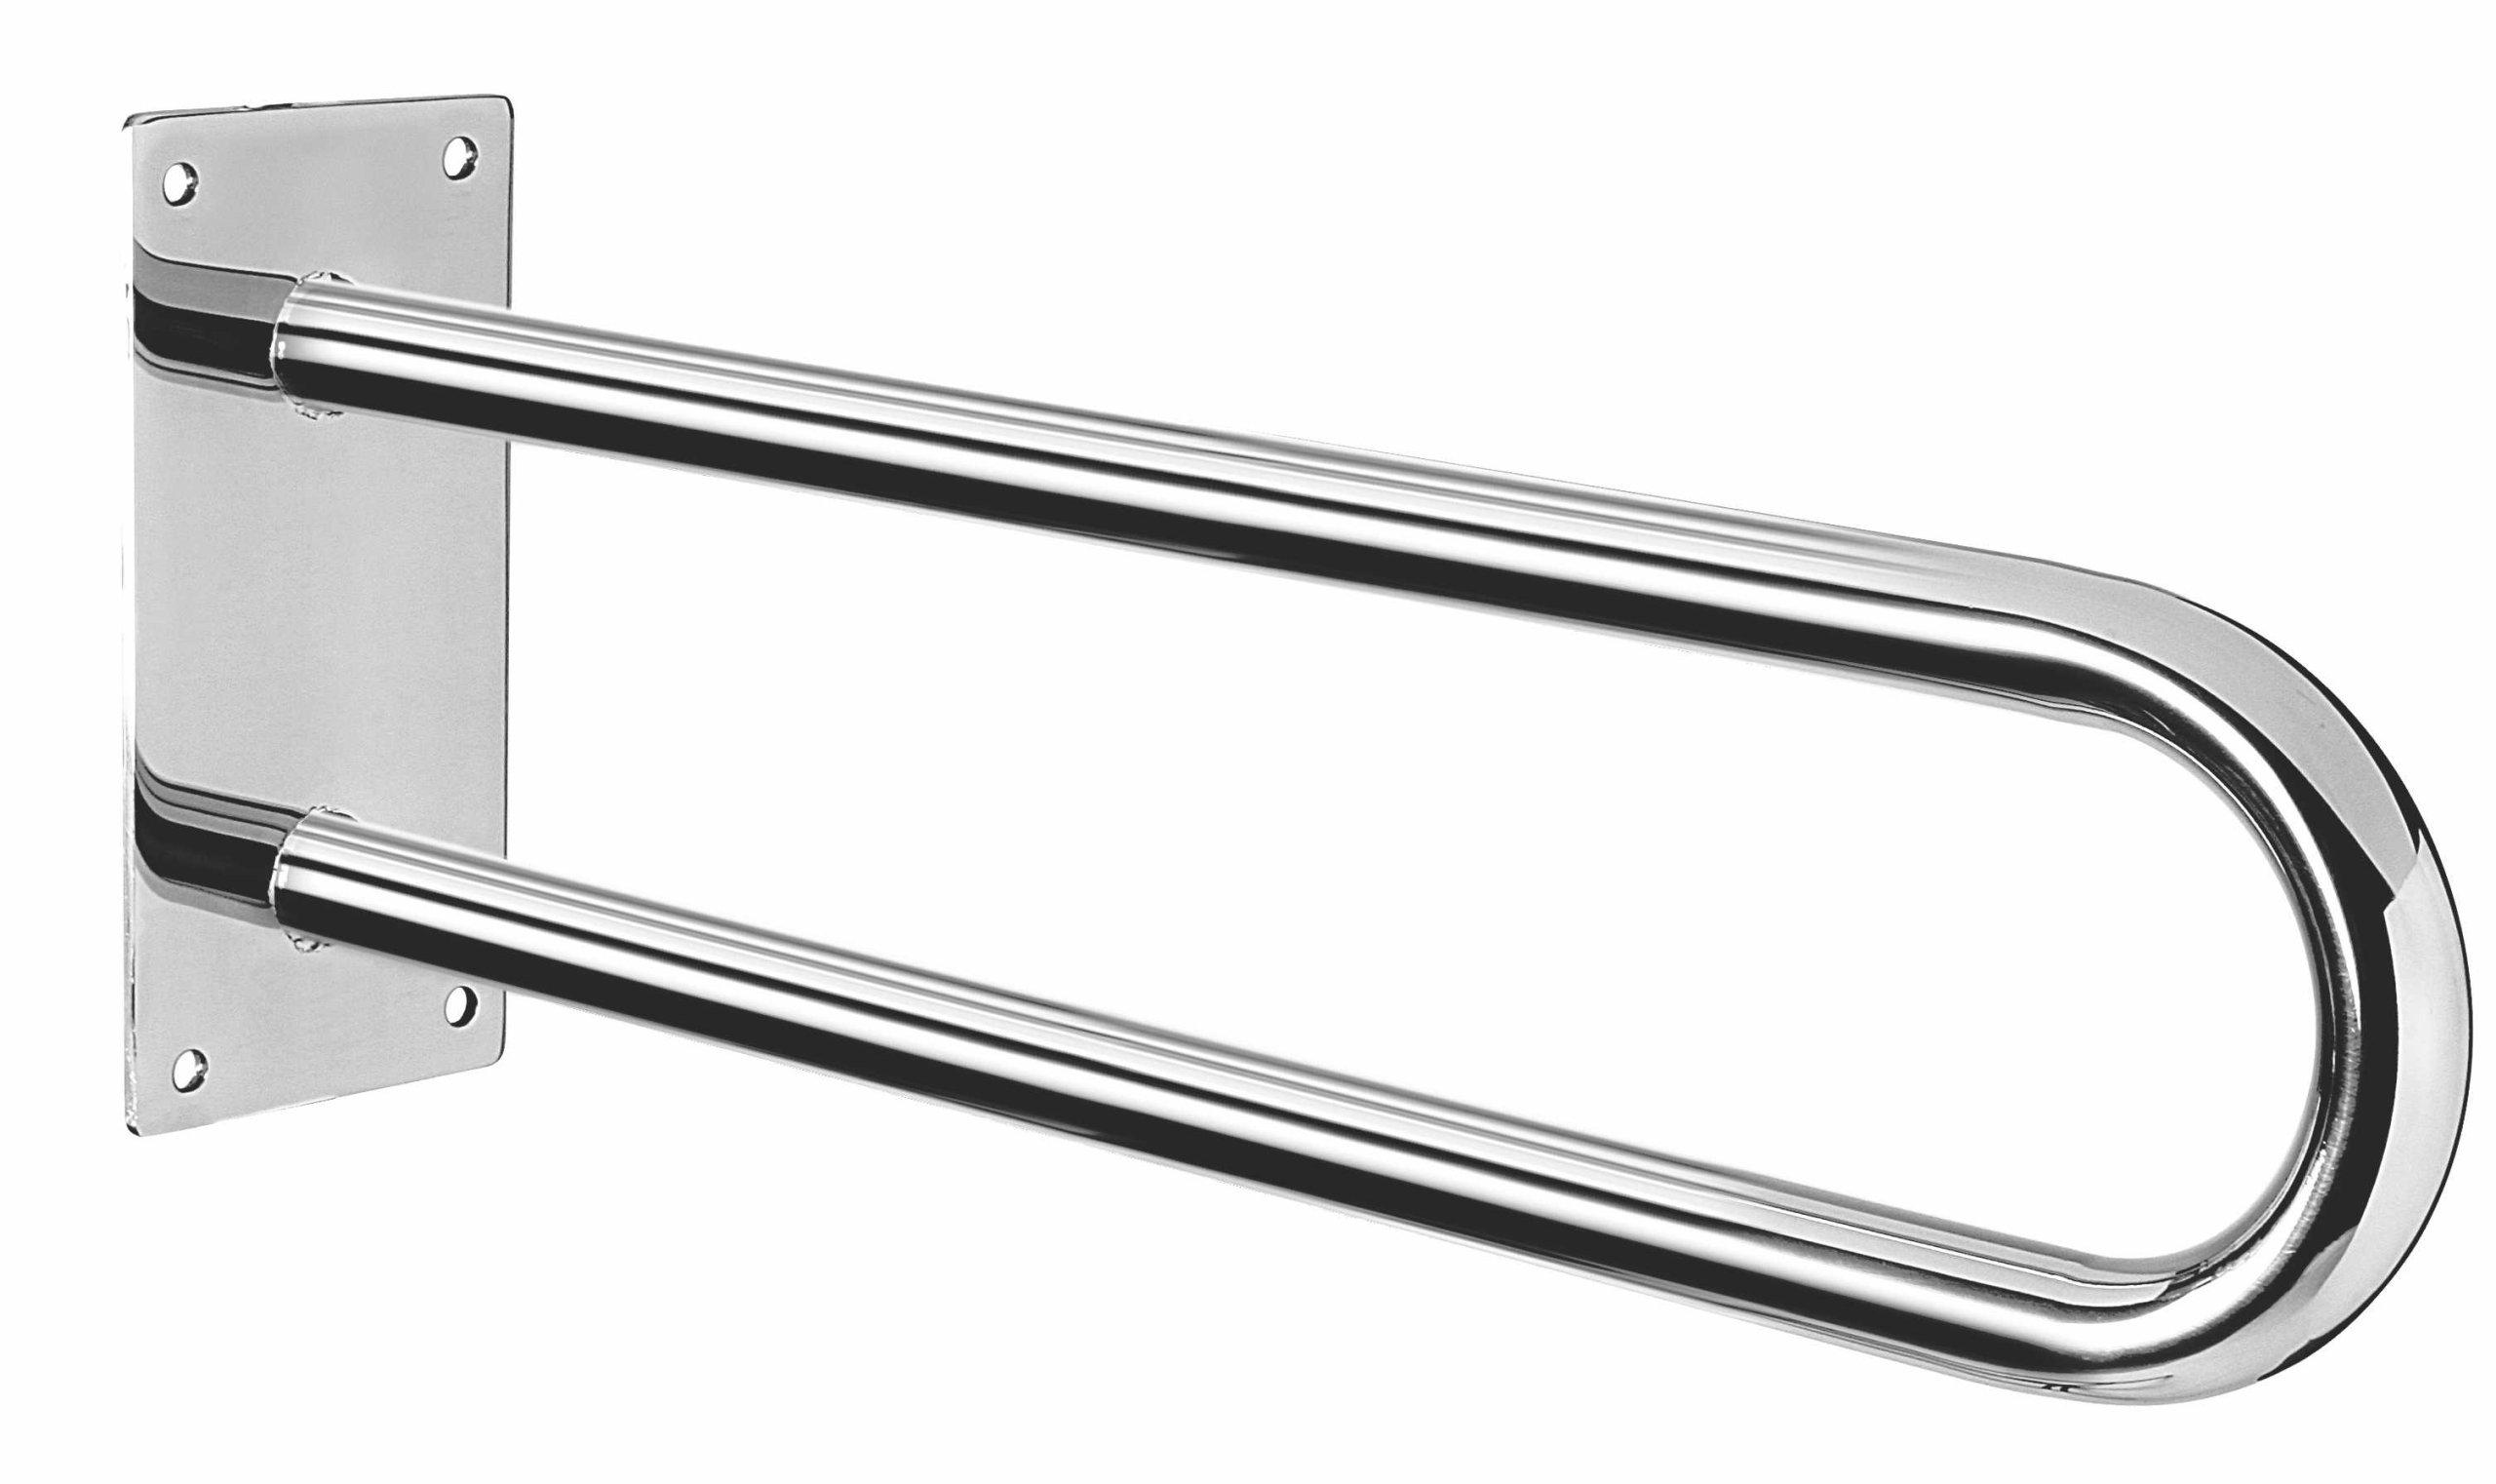 PRO Madlo - Rukoväť 600 mm 05499 CHROM